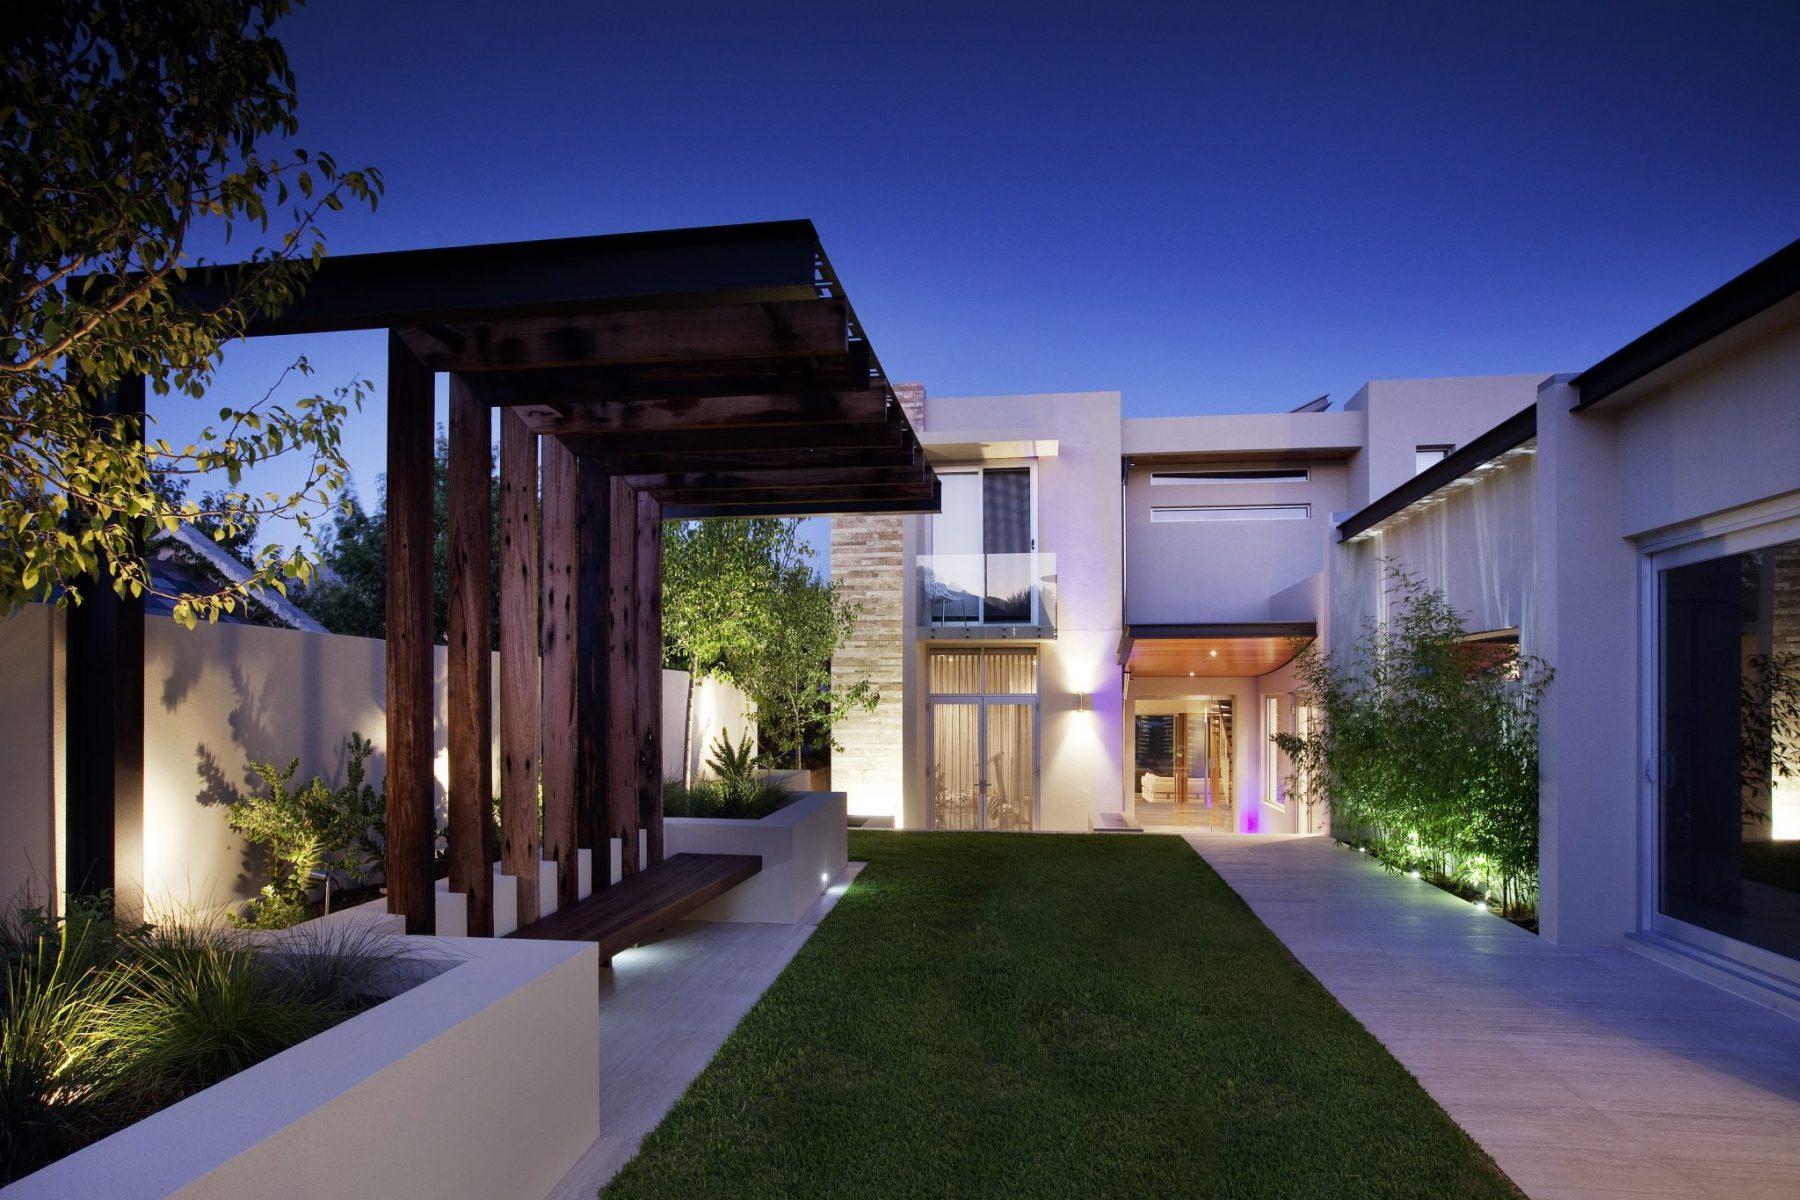 Bicton Perth property landscape design by Ritz Exterior Design